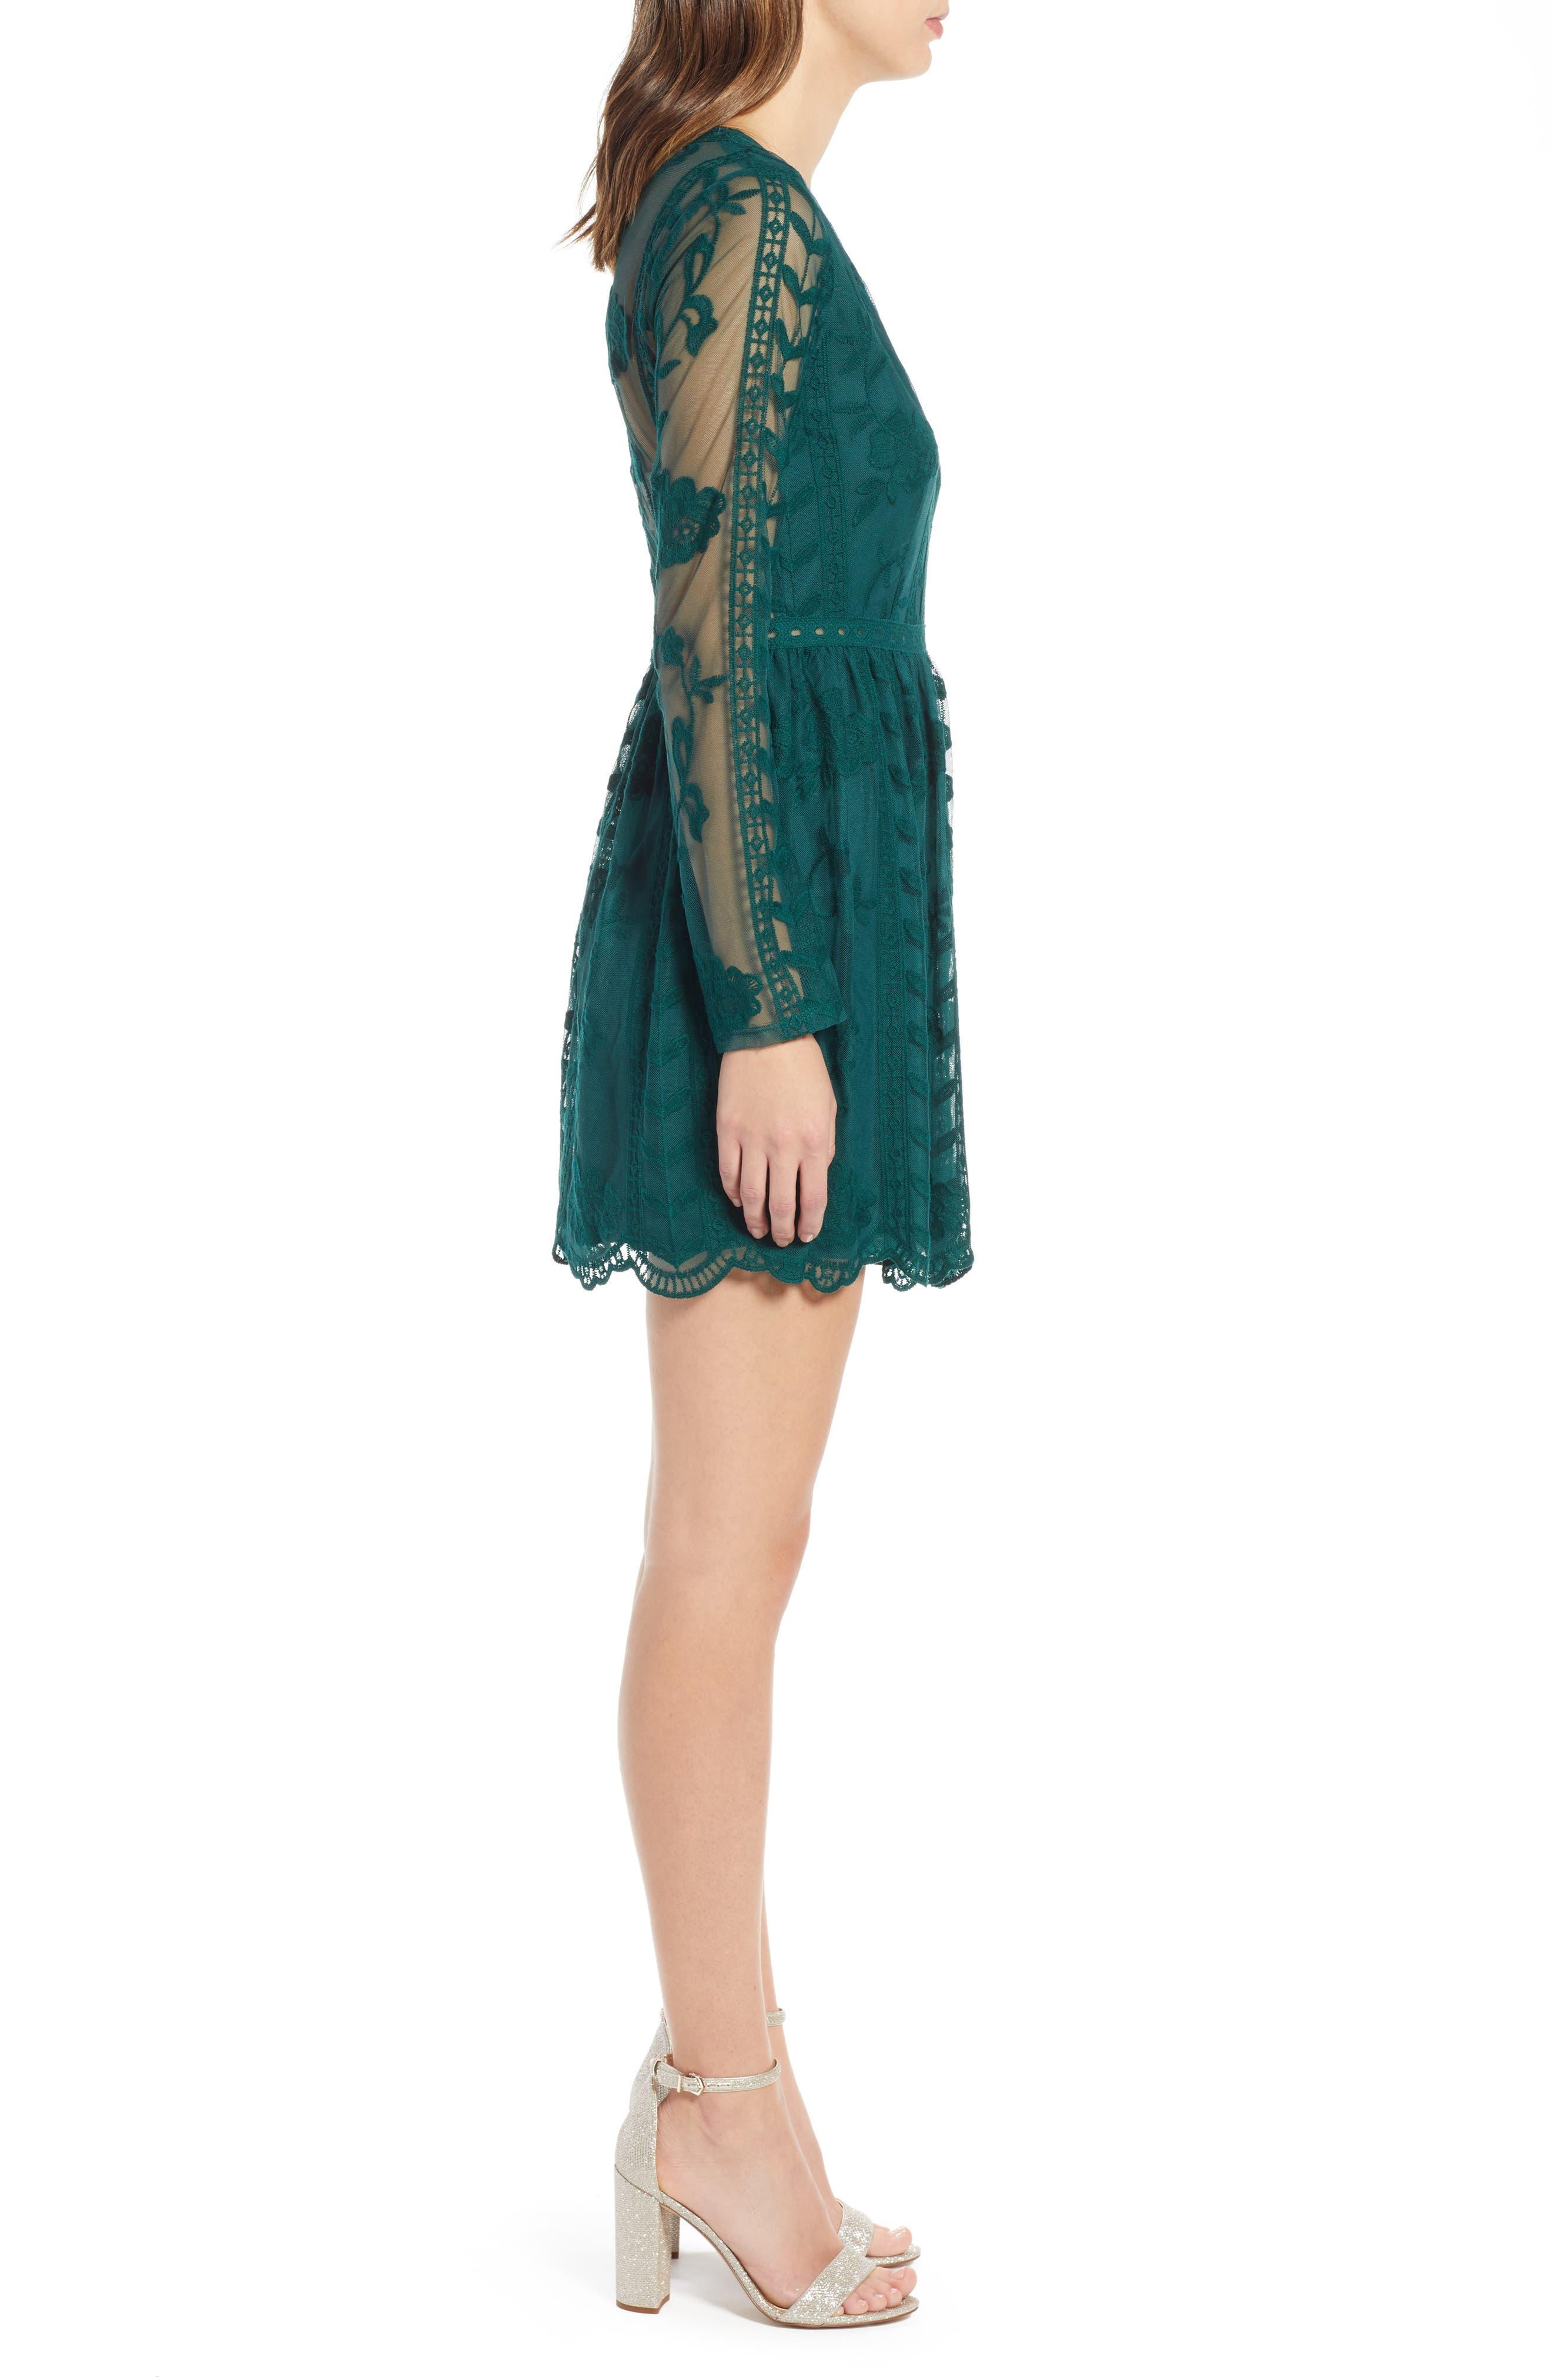 SOCIALITE, Long Sleeve V-Neck Lace Dress, Alternate thumbnail 4, color, 300